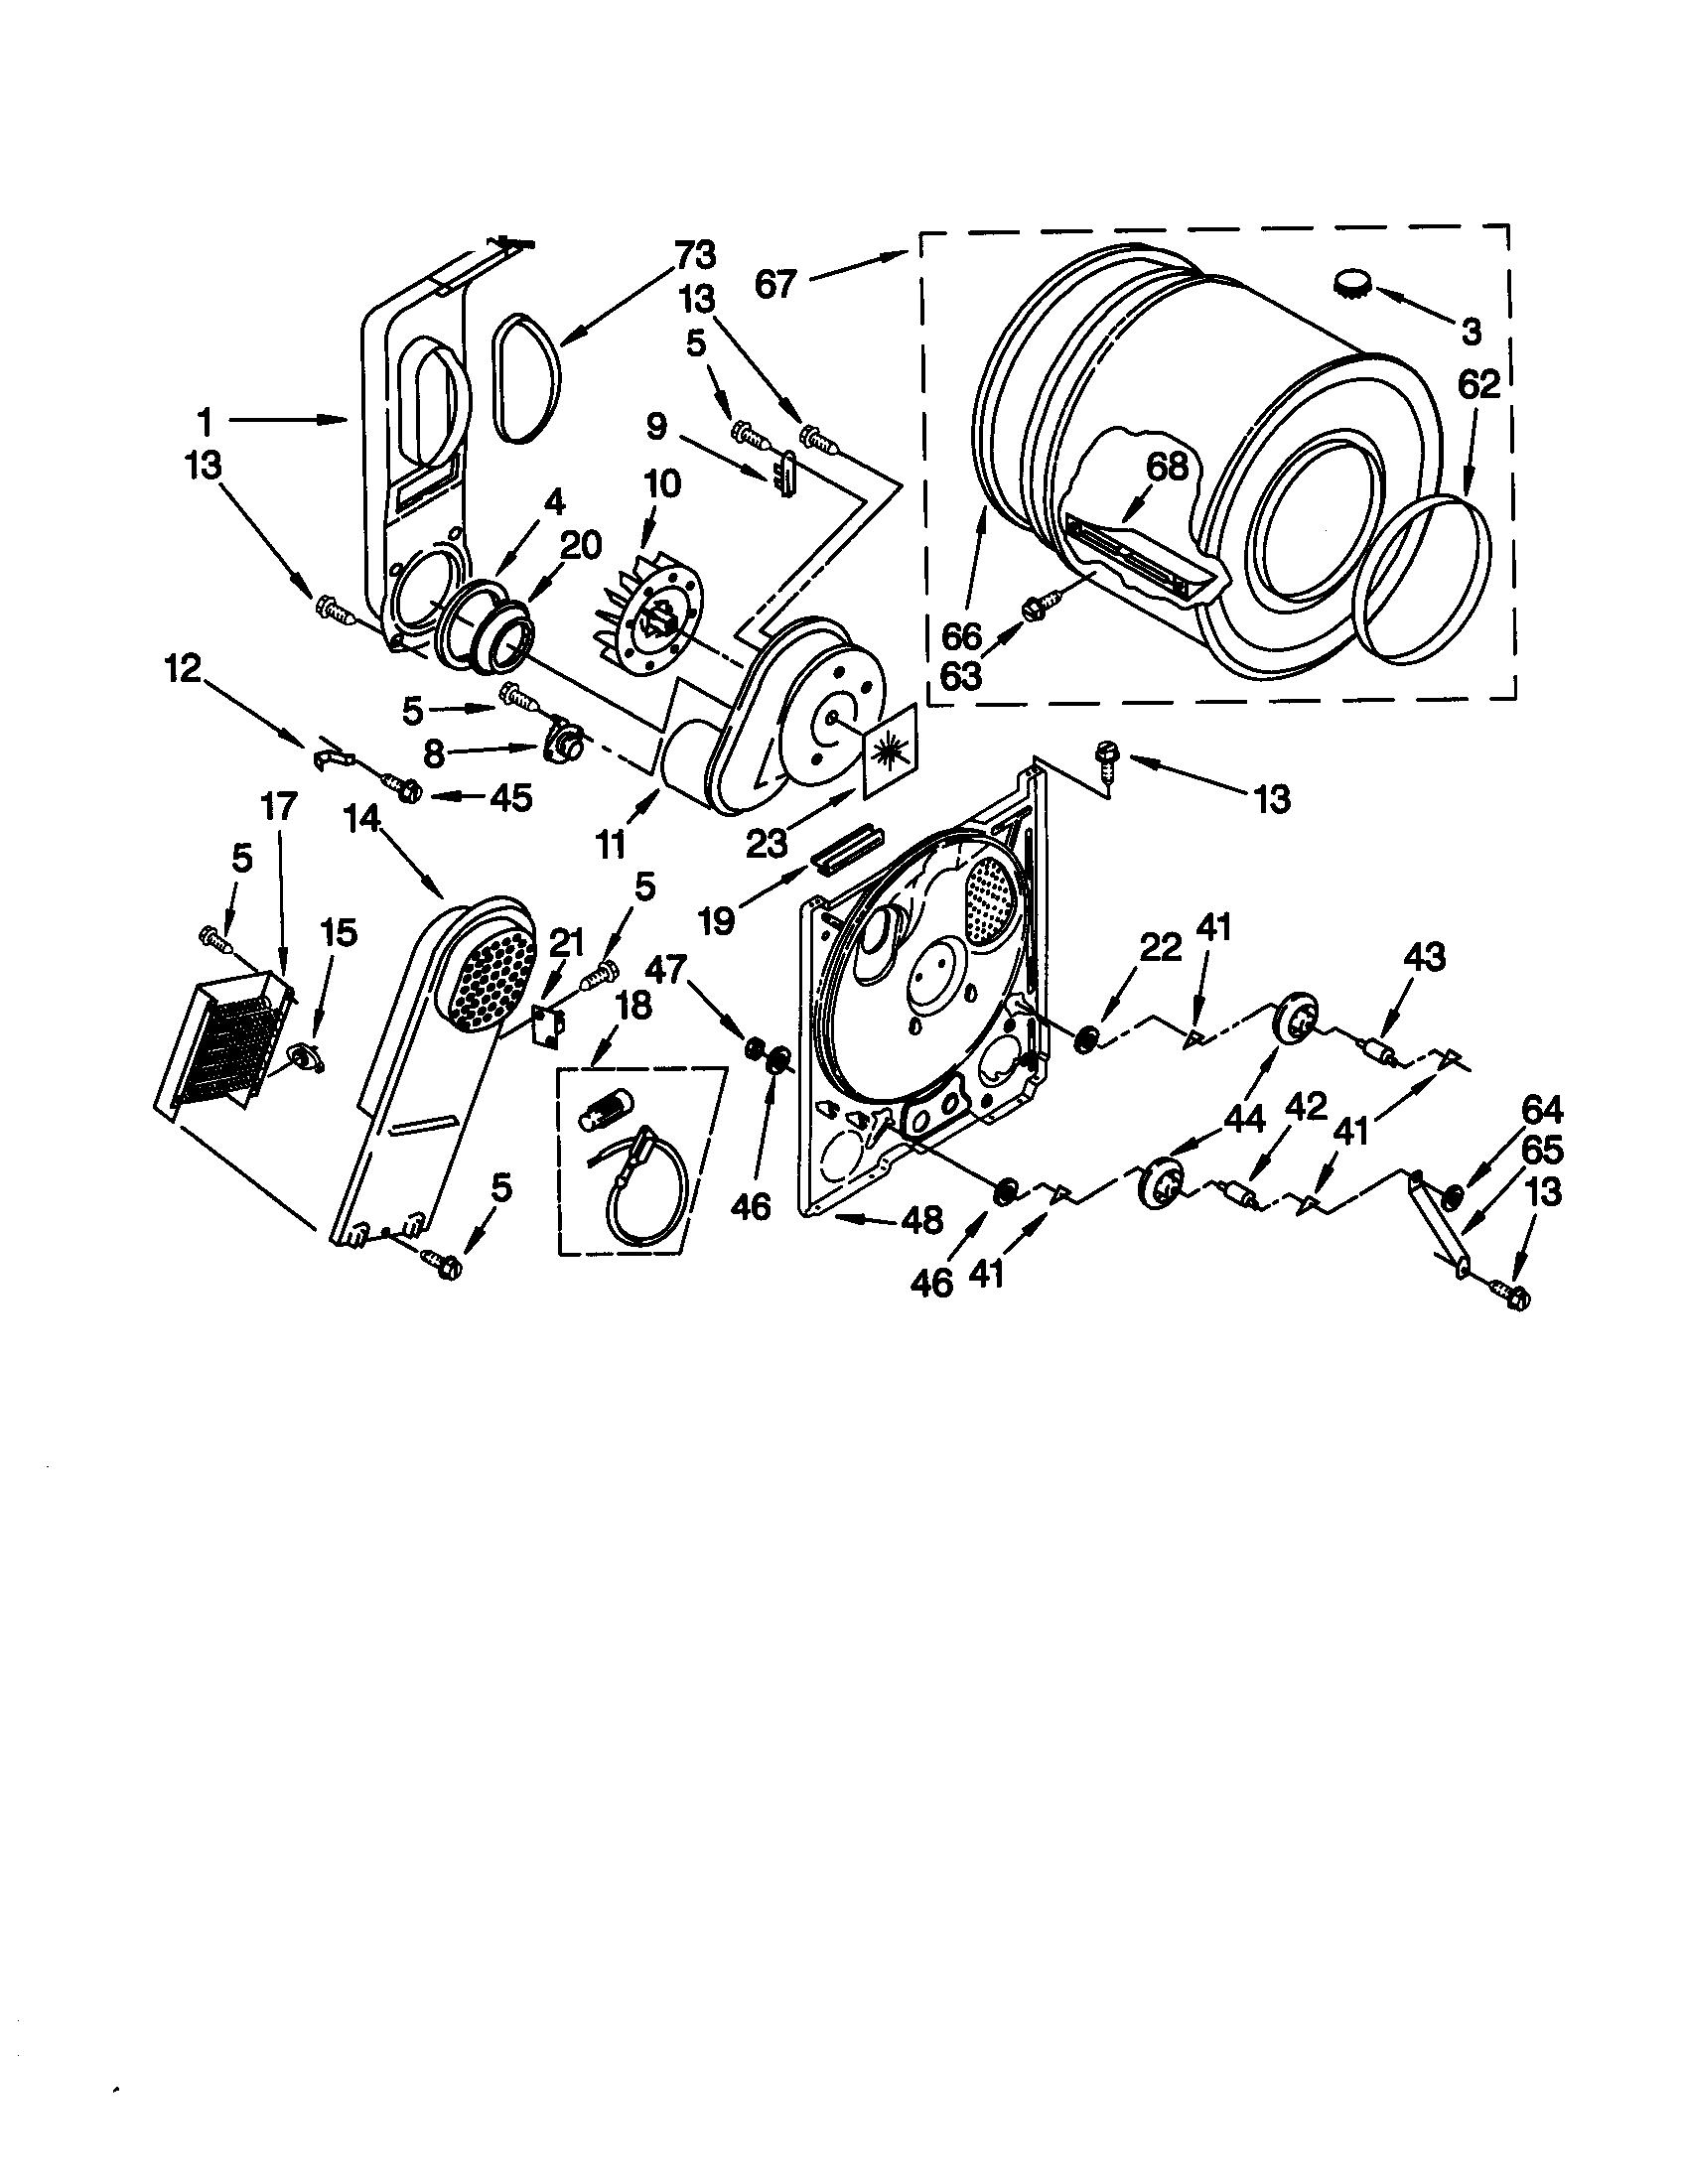 Kenmore 110 Heating Element Box